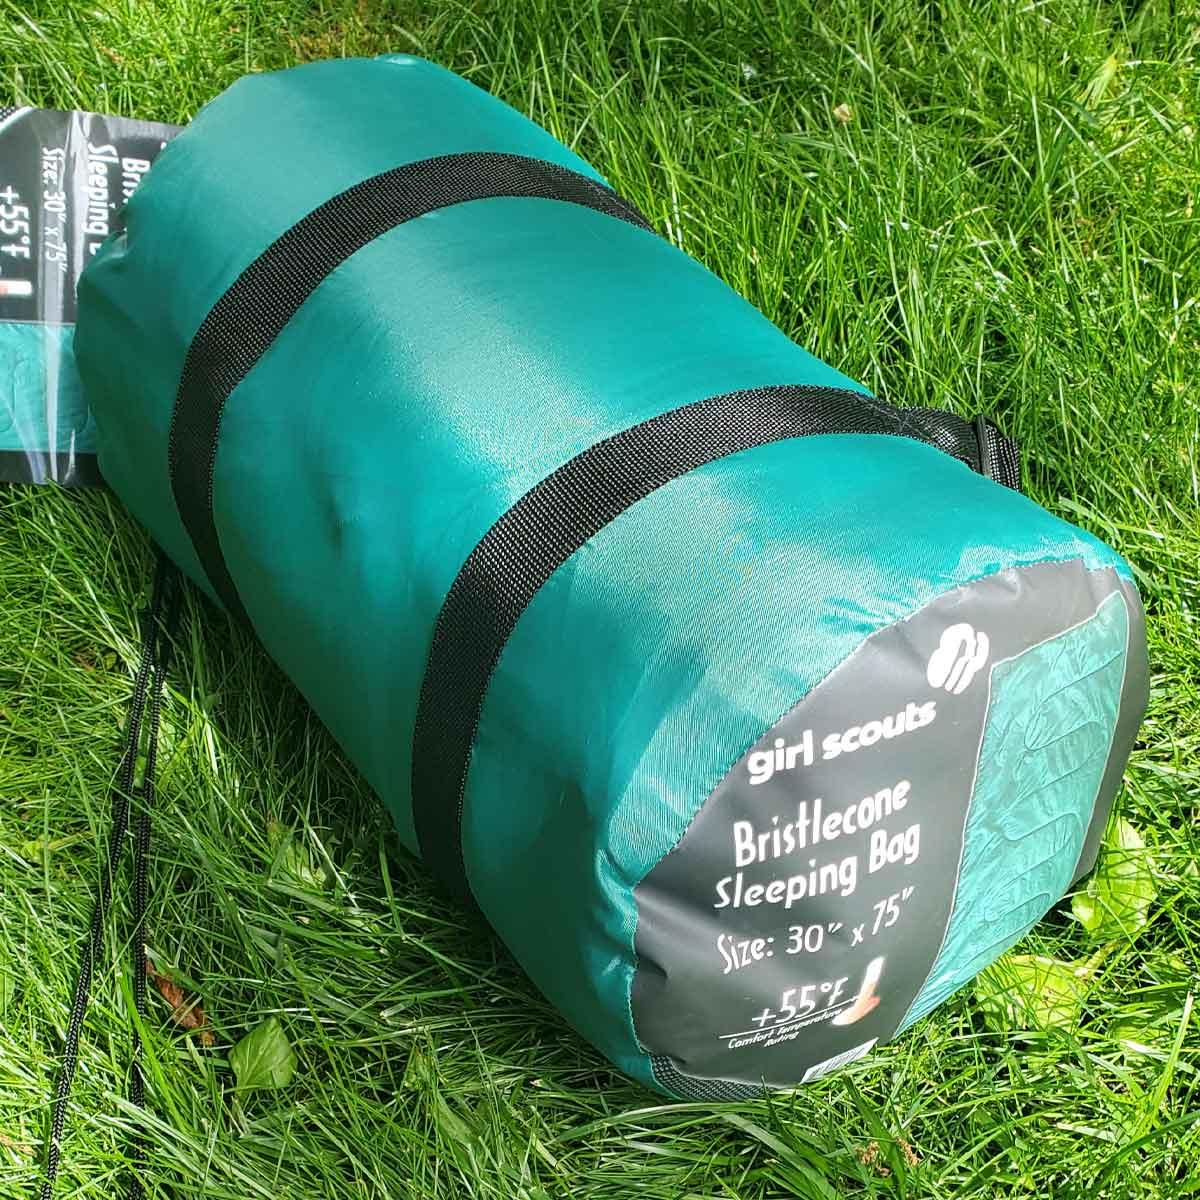 Girl Scout Bristlecone Sleeping Bag